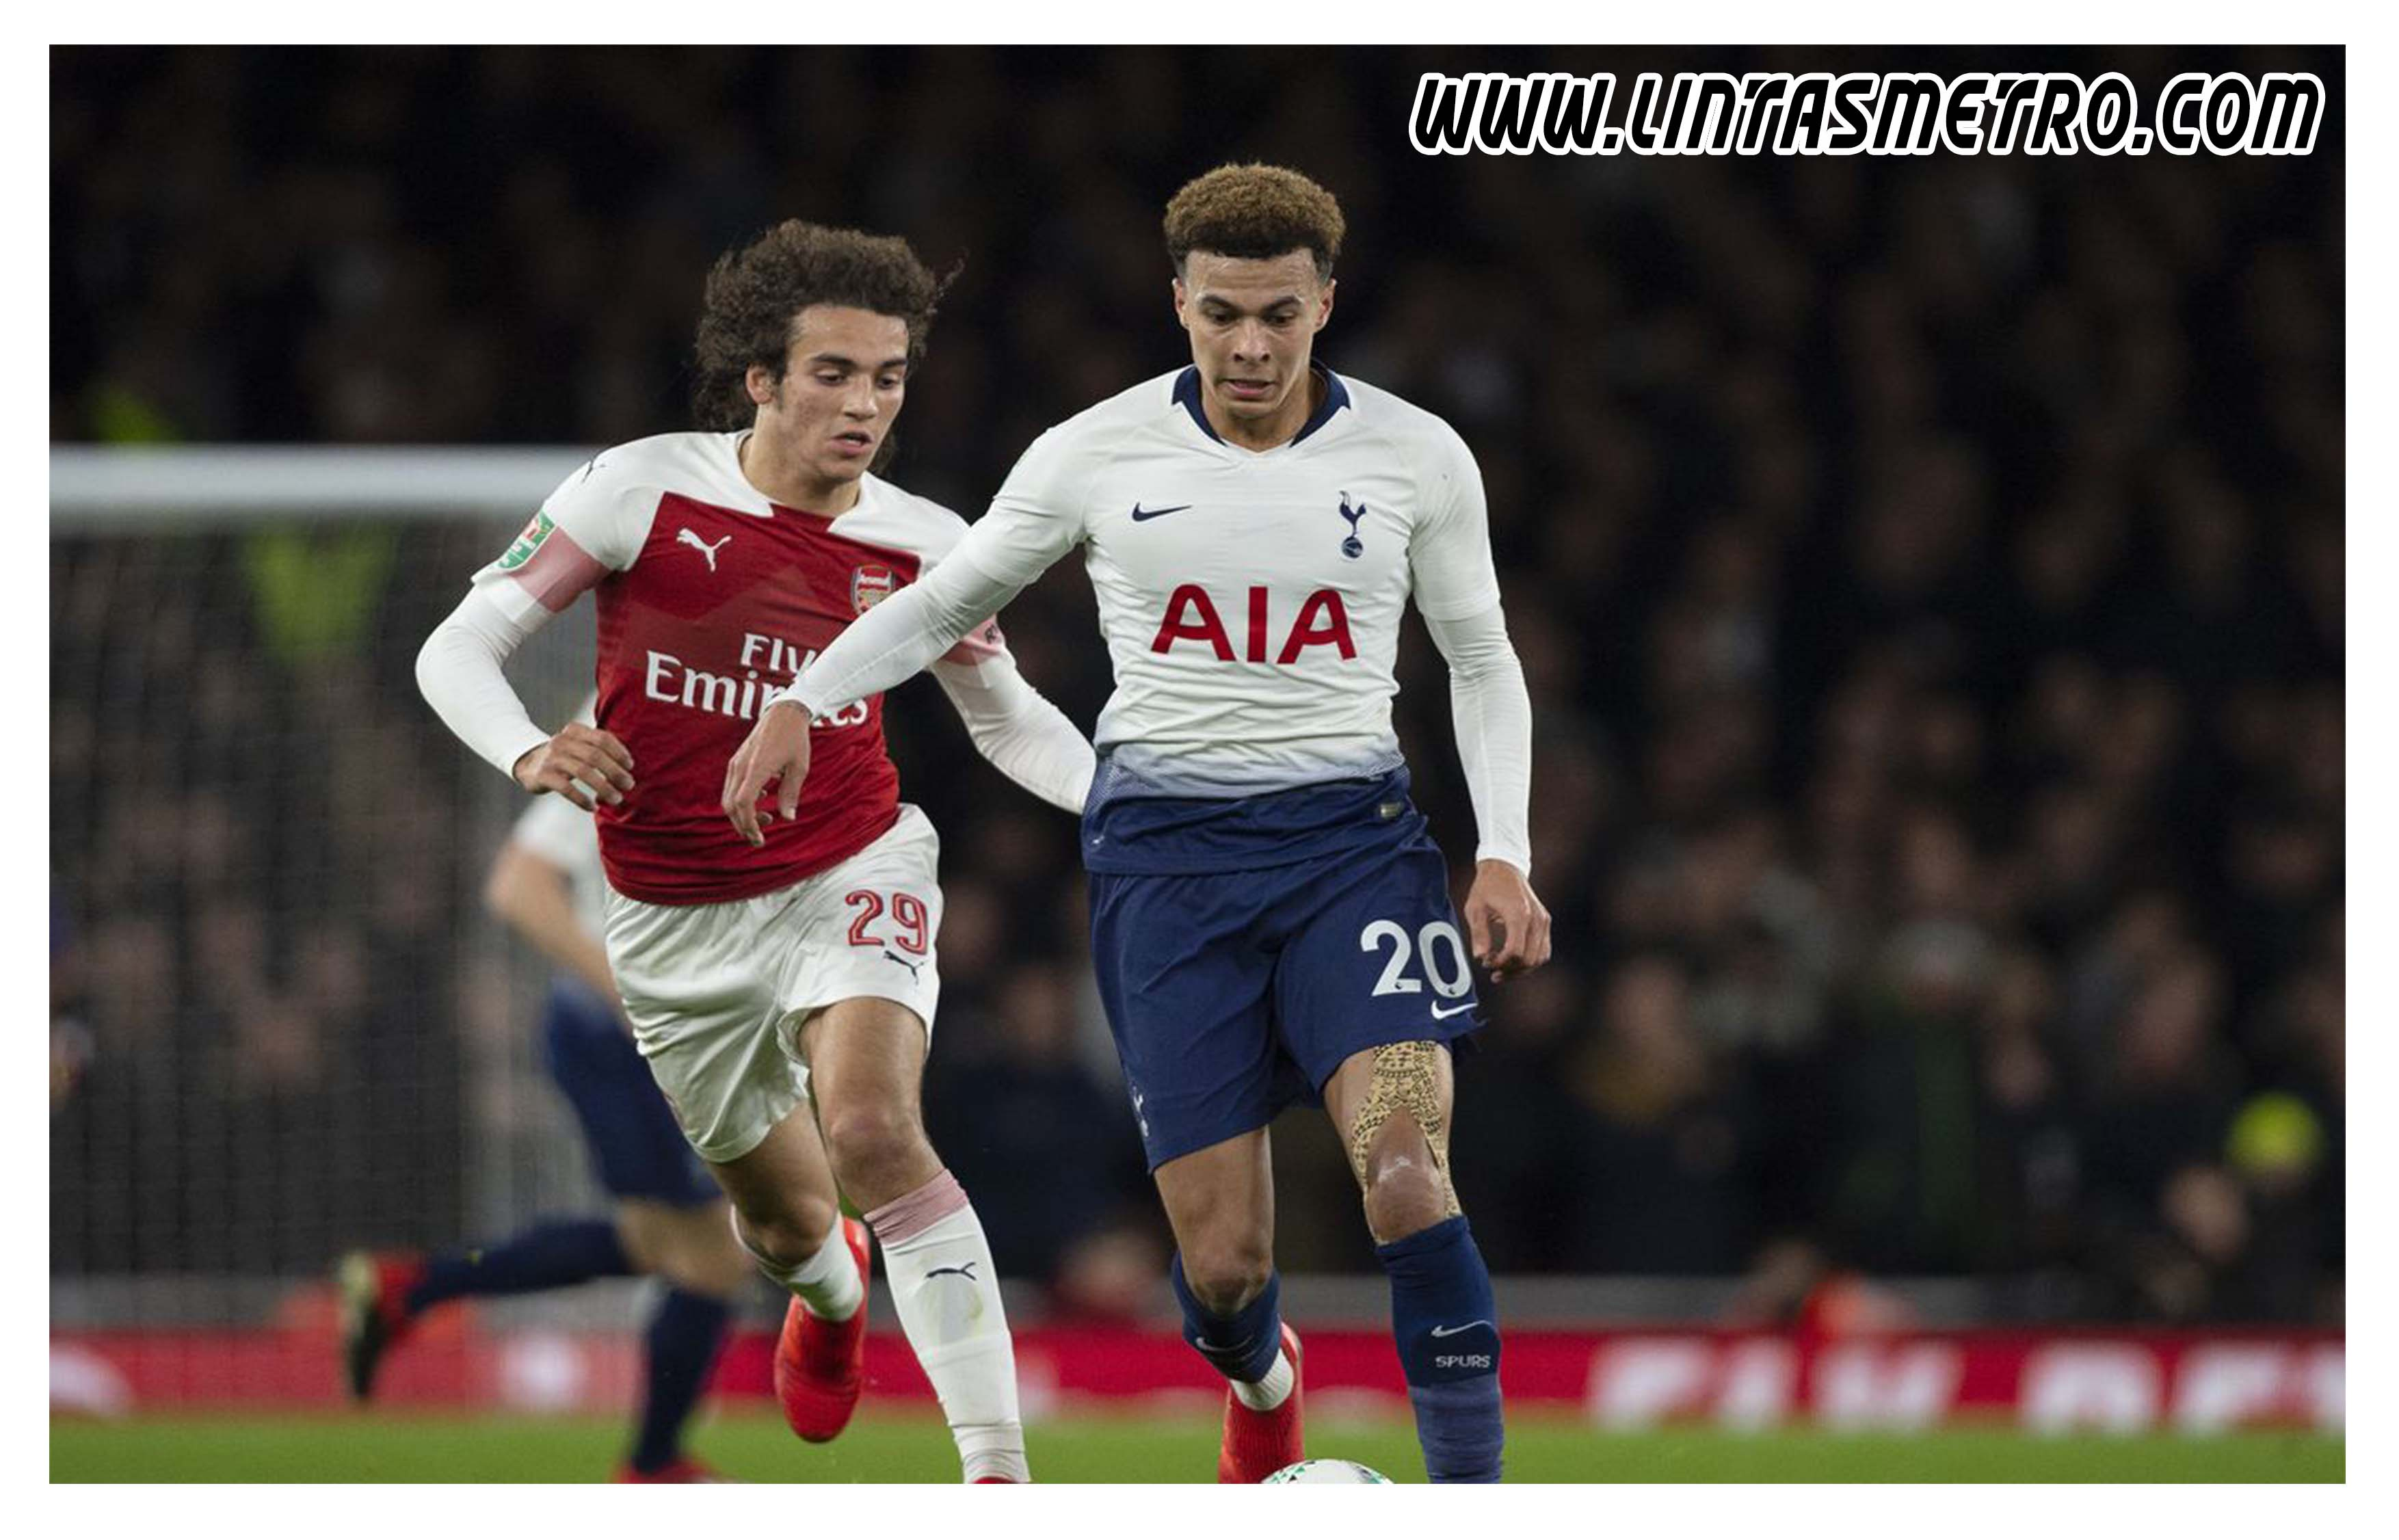 Tottenham Hotspur vs Arsenal Prediksi Liga Inggris 2020/21